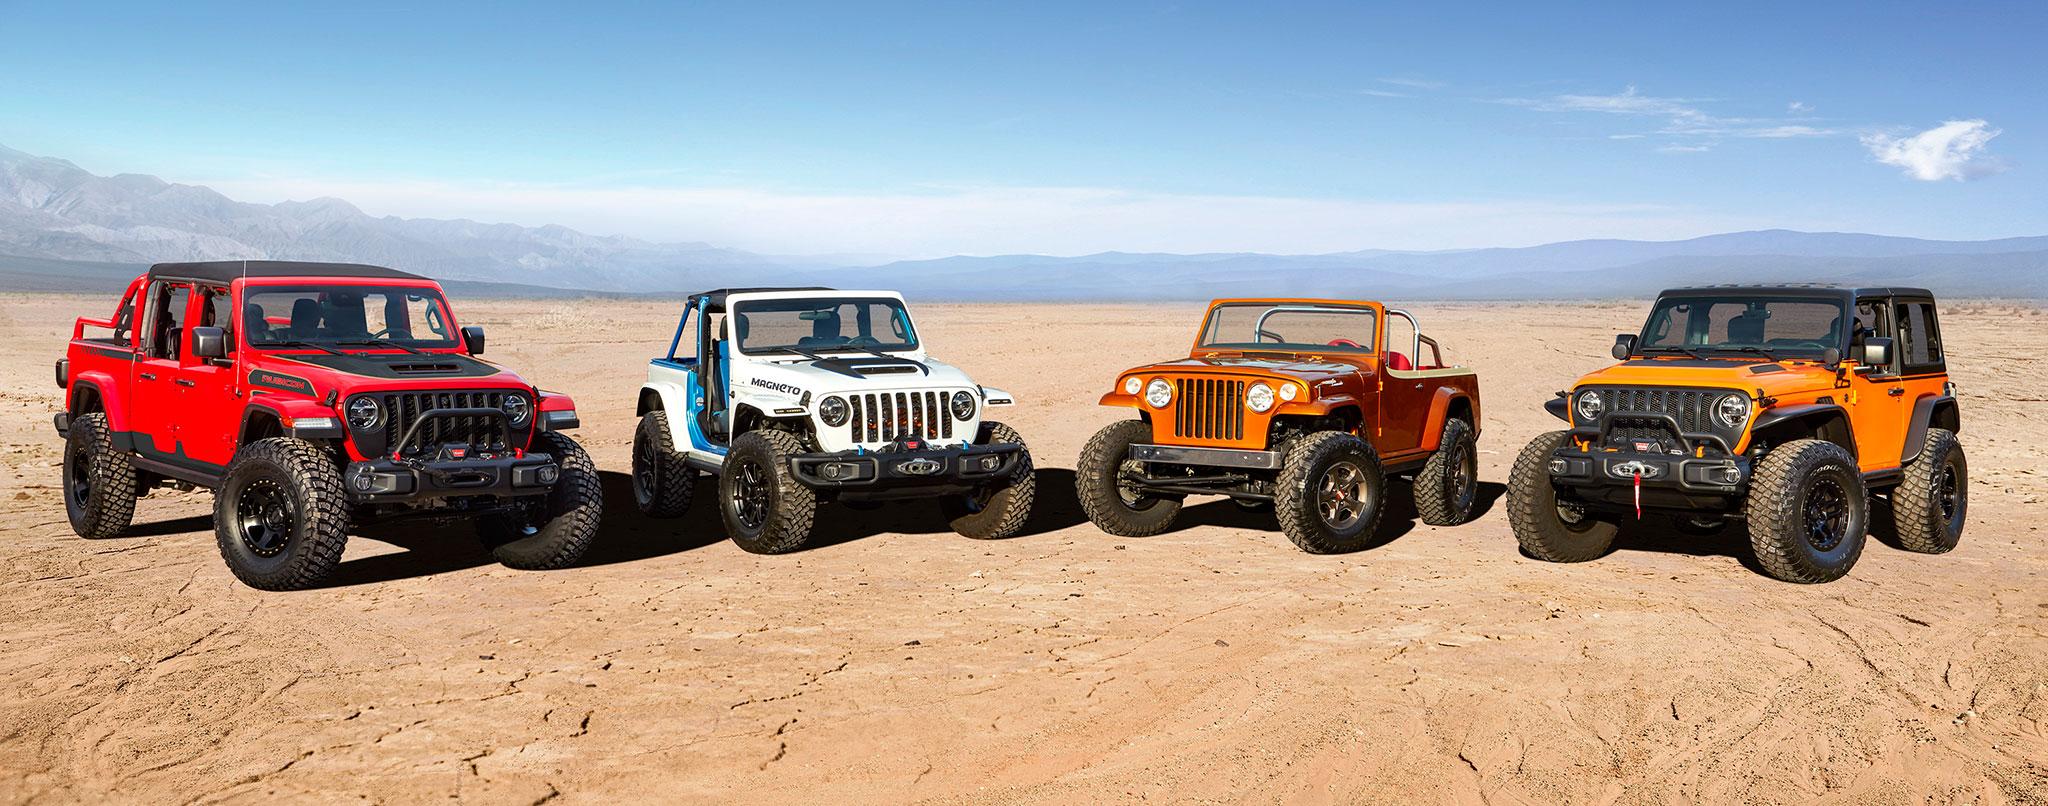 2021 Jeep Red Bare Jeep-Magneto Jeepster-Beach Jeep Orange Peelz Concepts - Concept Cars de Jeep®.